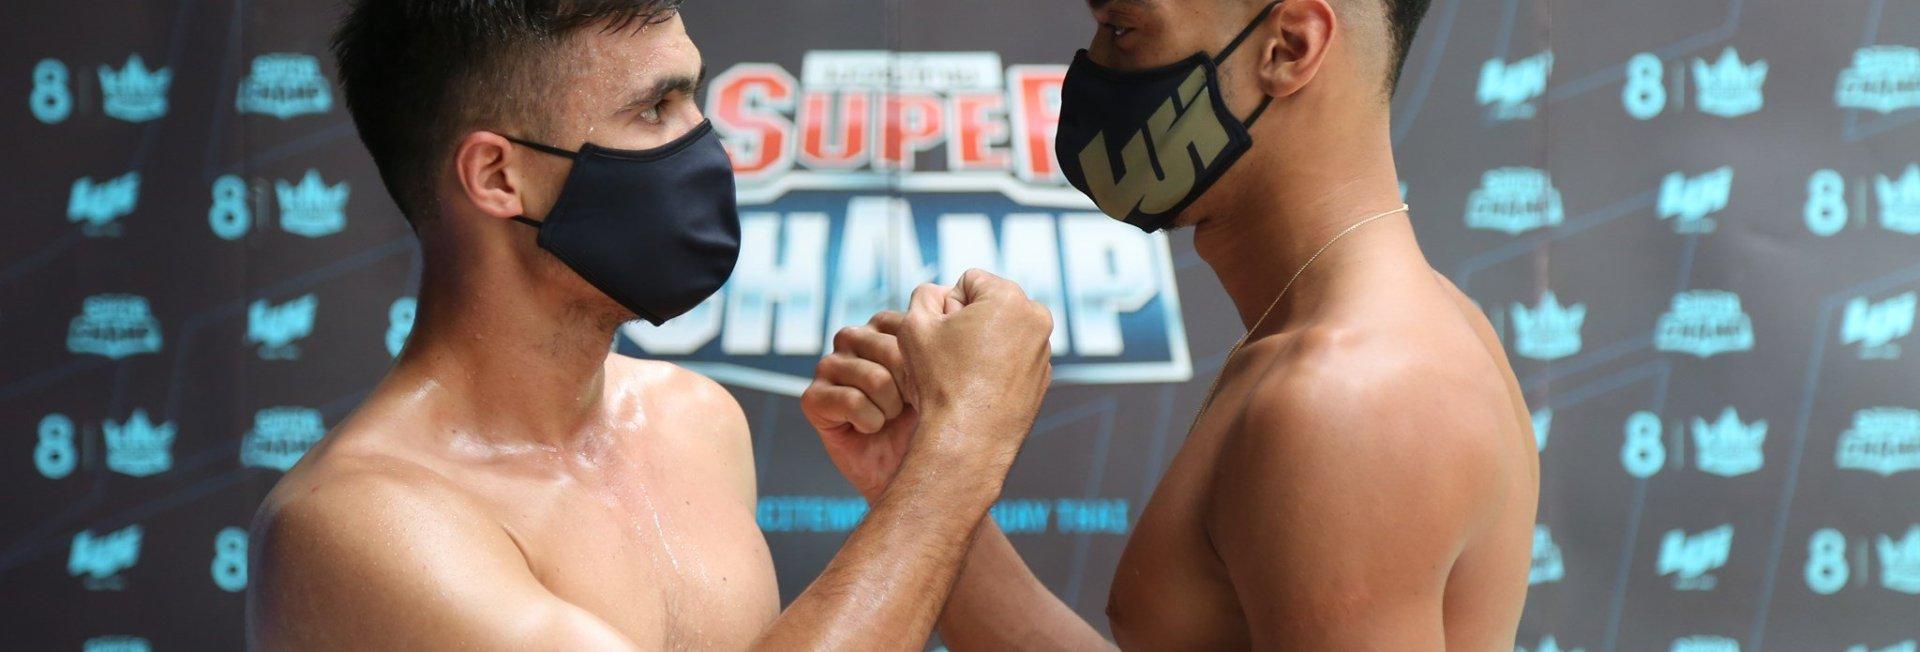 Muay Thai Super Champ - How to watch, Live stream